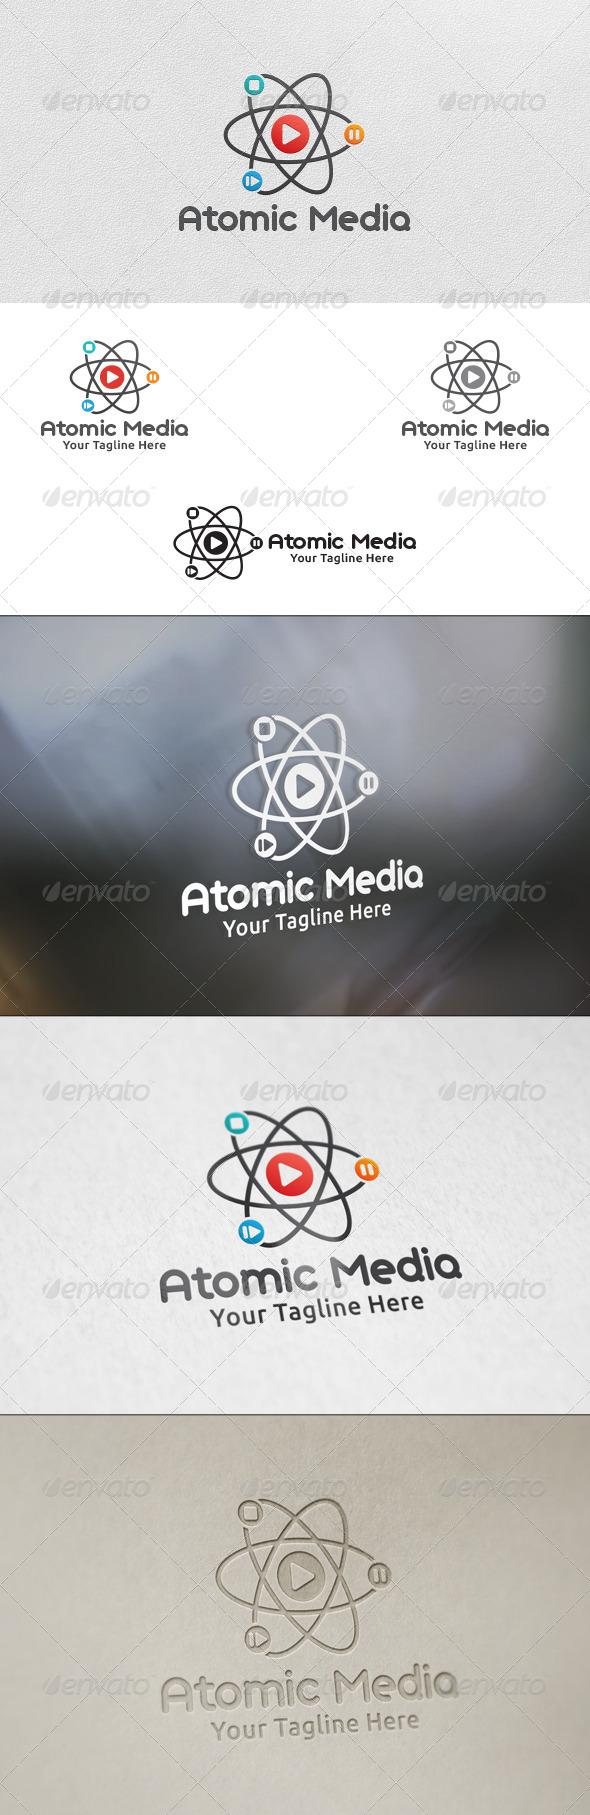 Atomic Media - Logo Template - Symbols Logo Templates